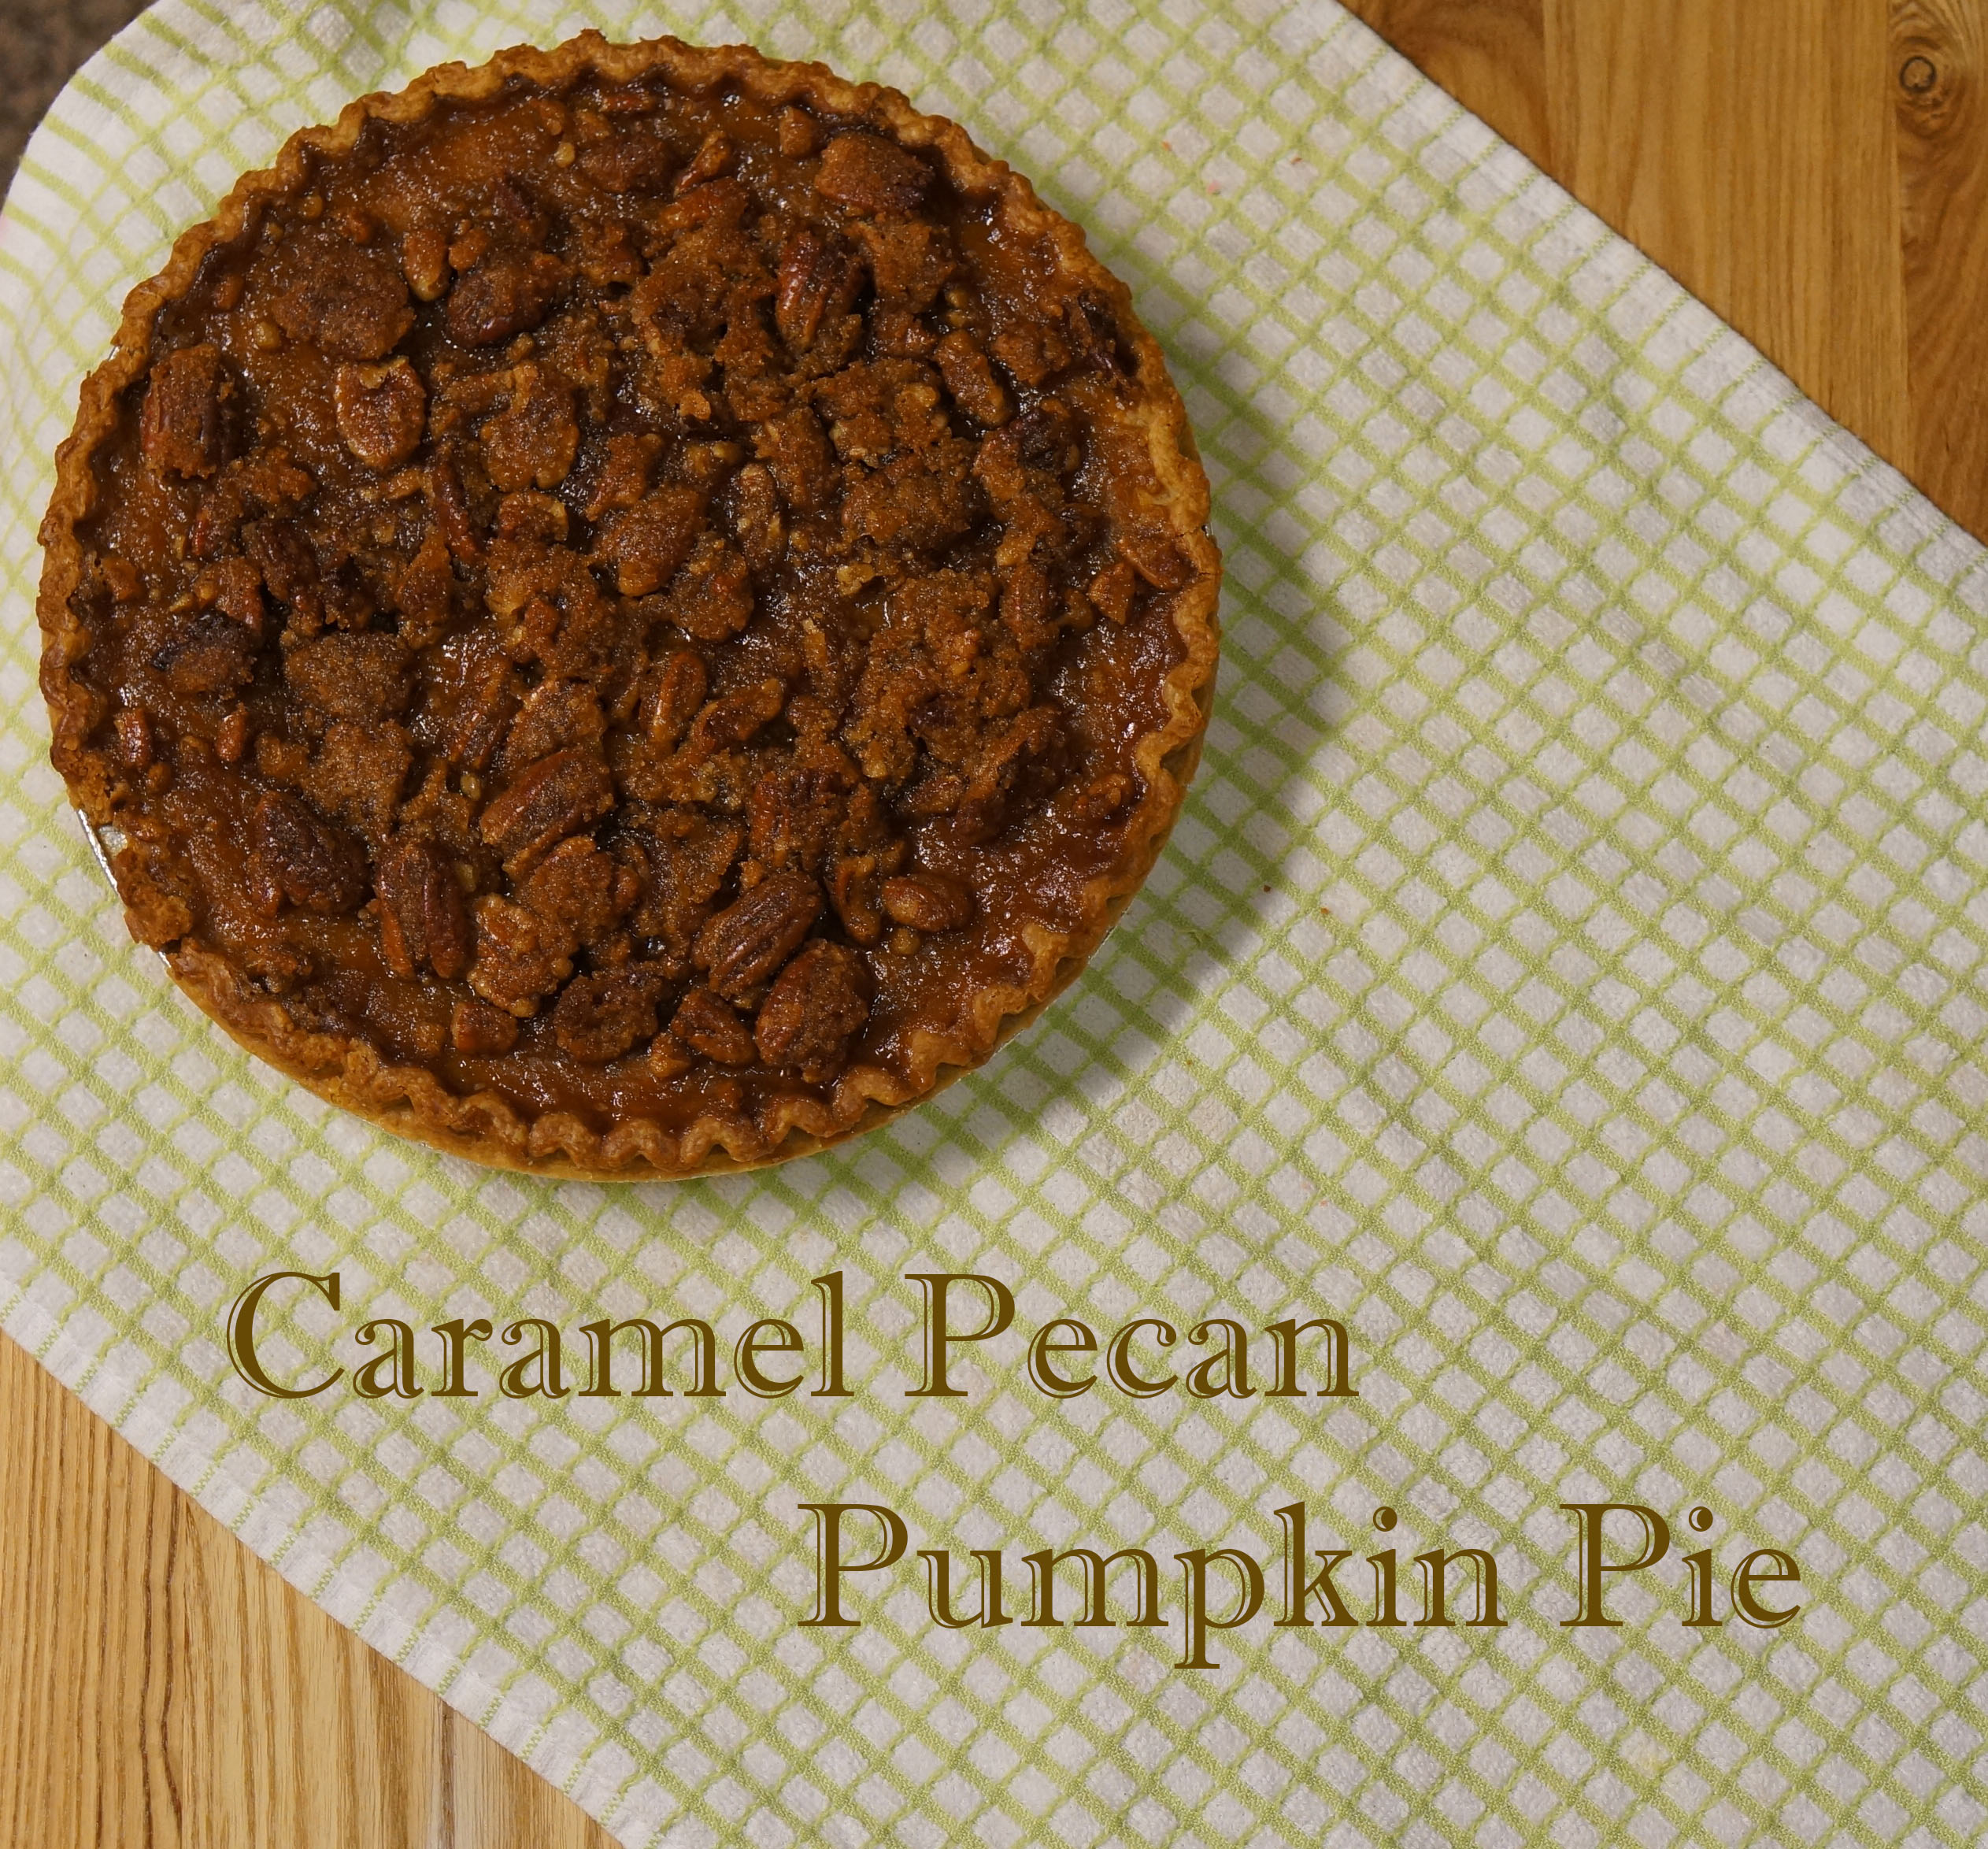 Watch Pumpkin Pie with Pecan-Caramel Topping video